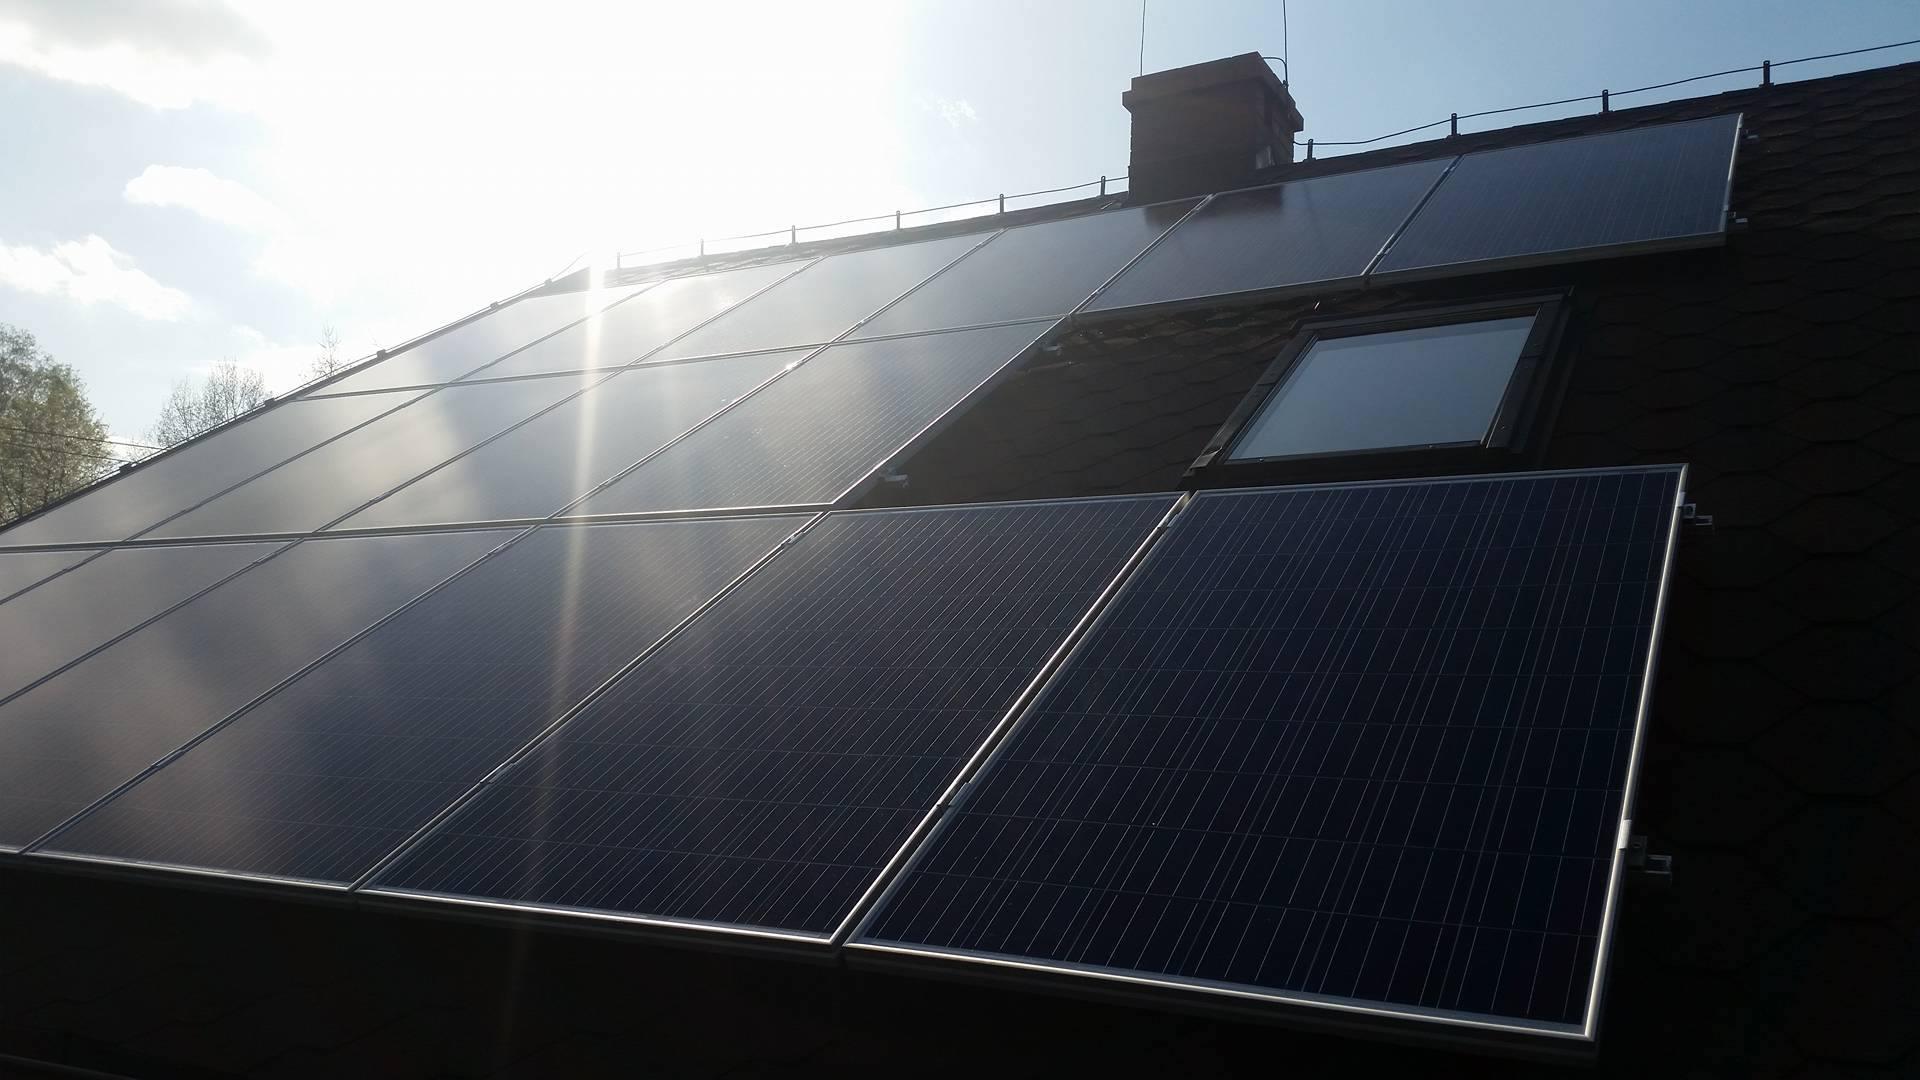 Jastrzębie-Zdrój - Moc 7,28 kWp On-grid